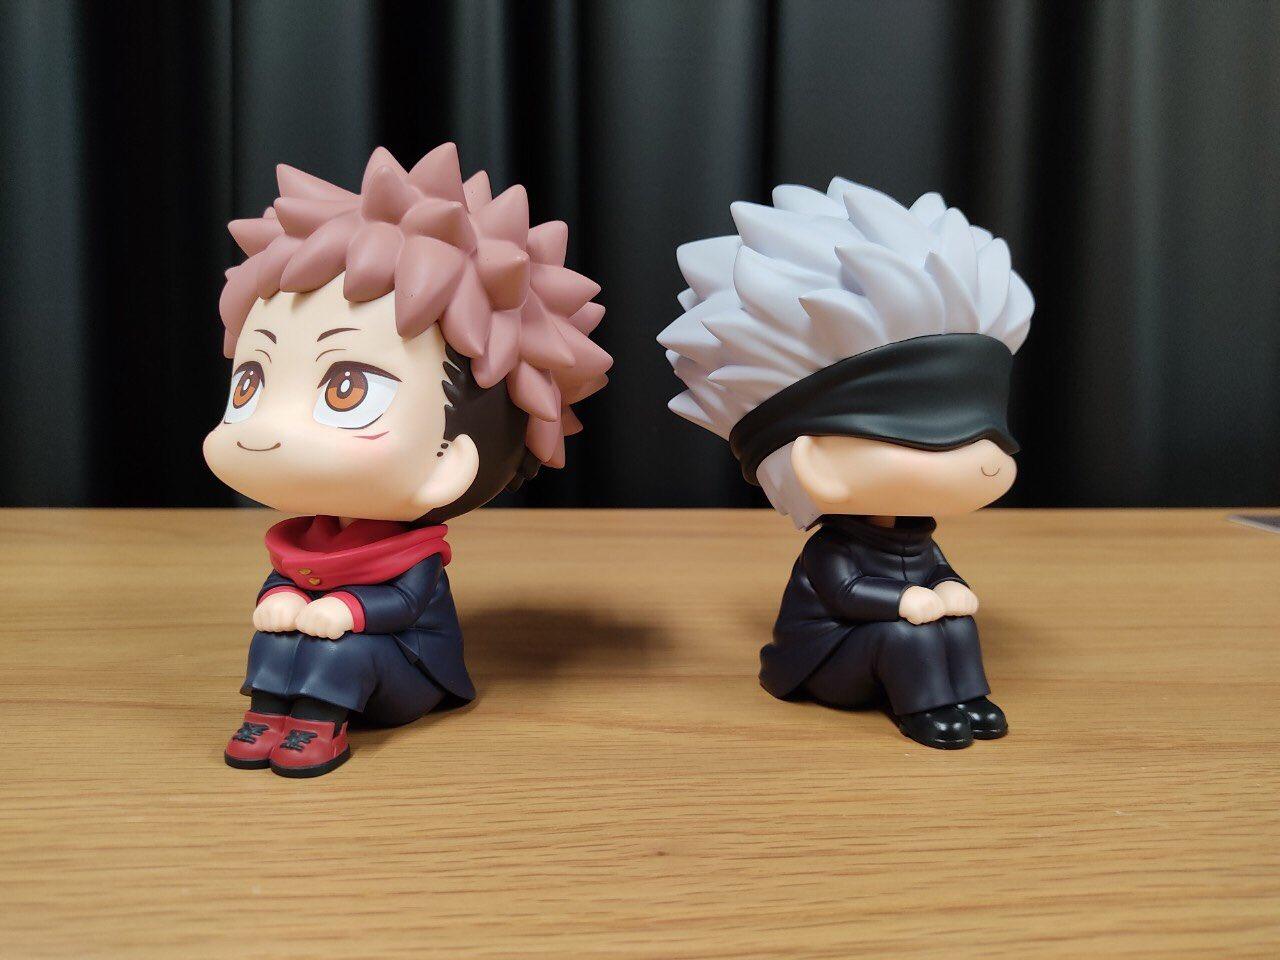 satoru and Yuji